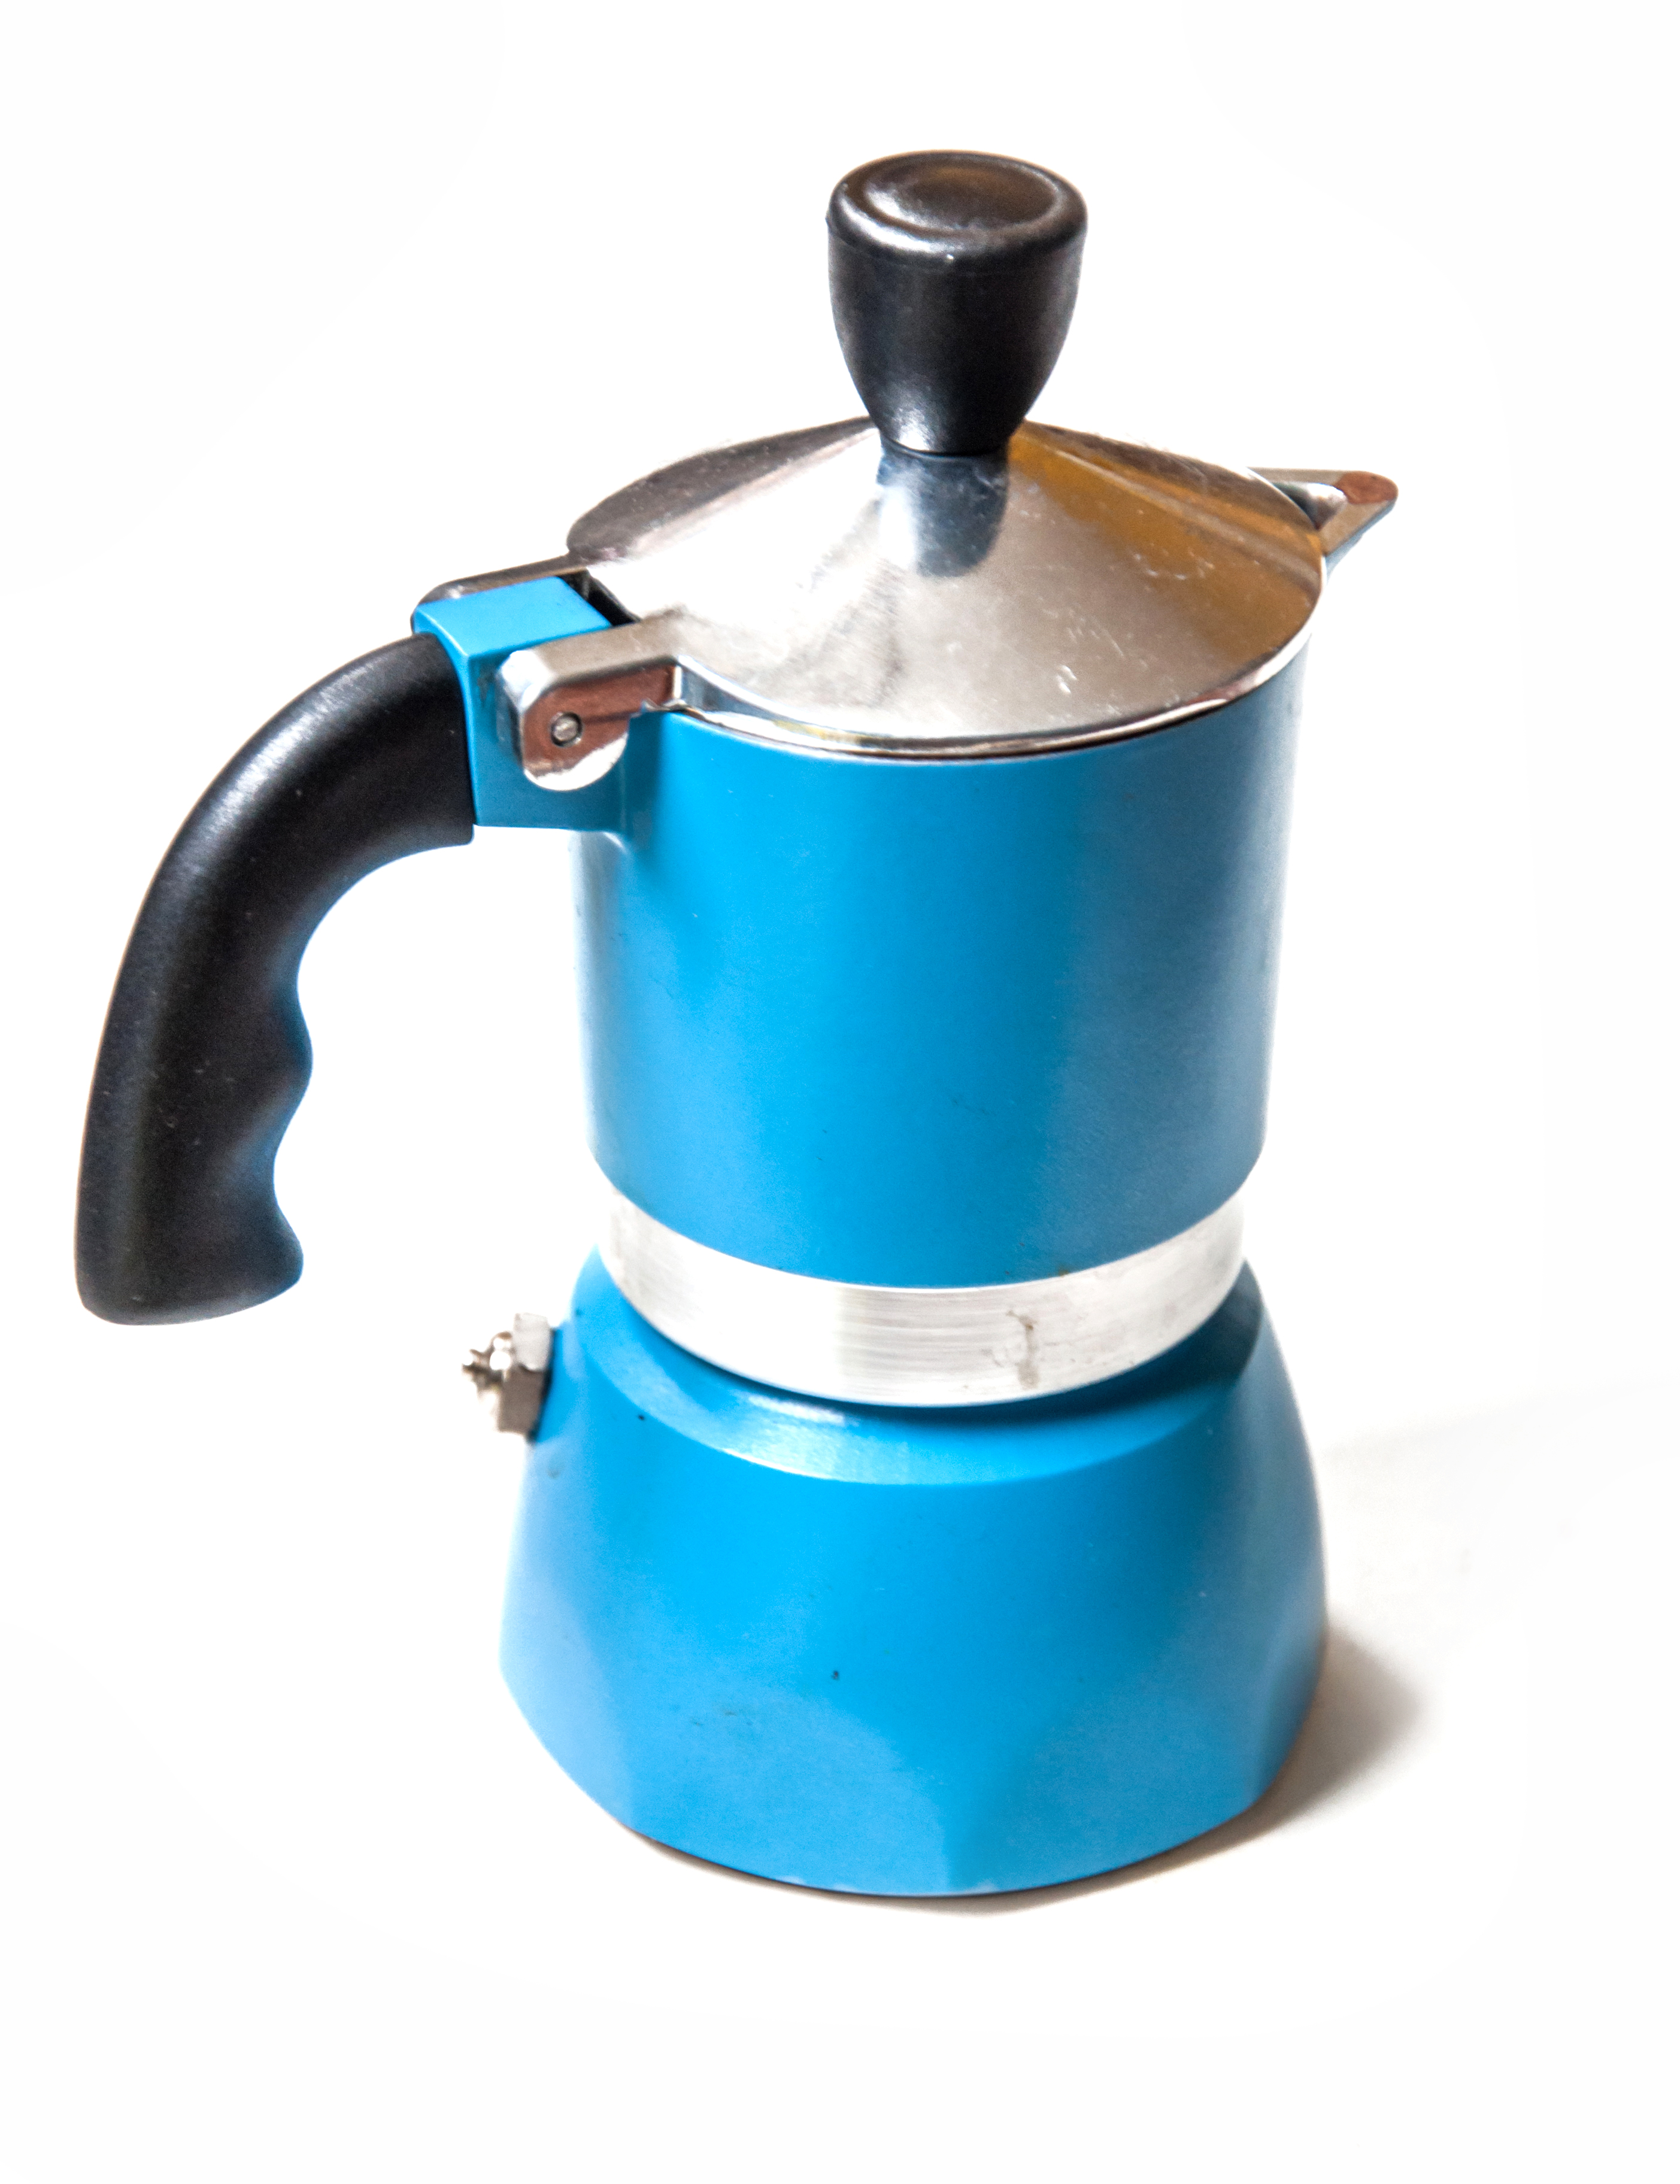 Italian coffee maker, Aged, Moka, Valves, Used, HQ Photo